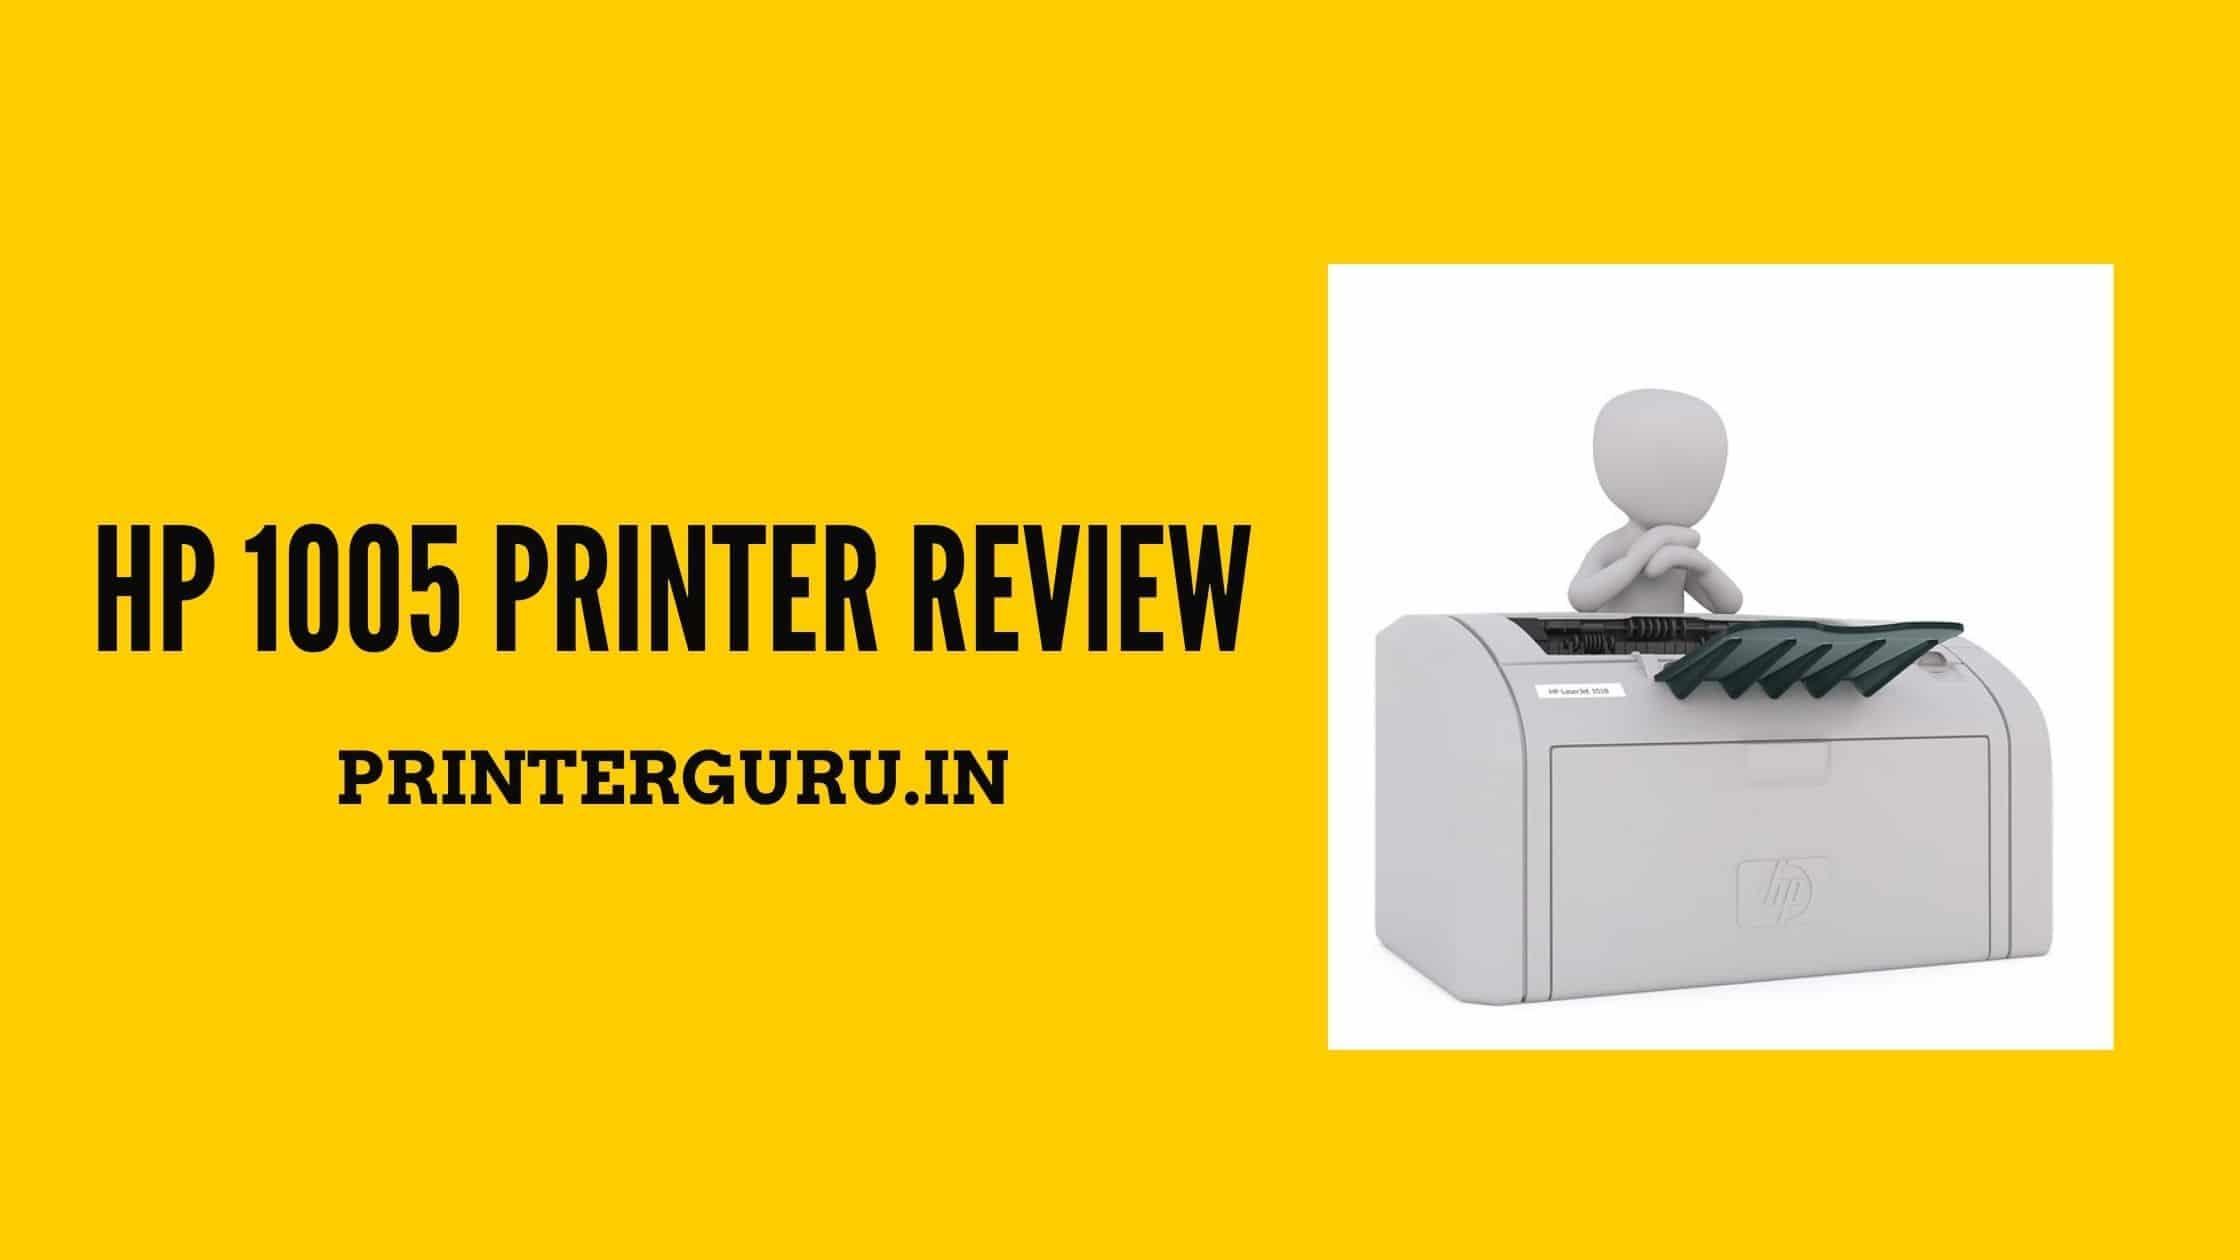 HP 1005 Printer Review